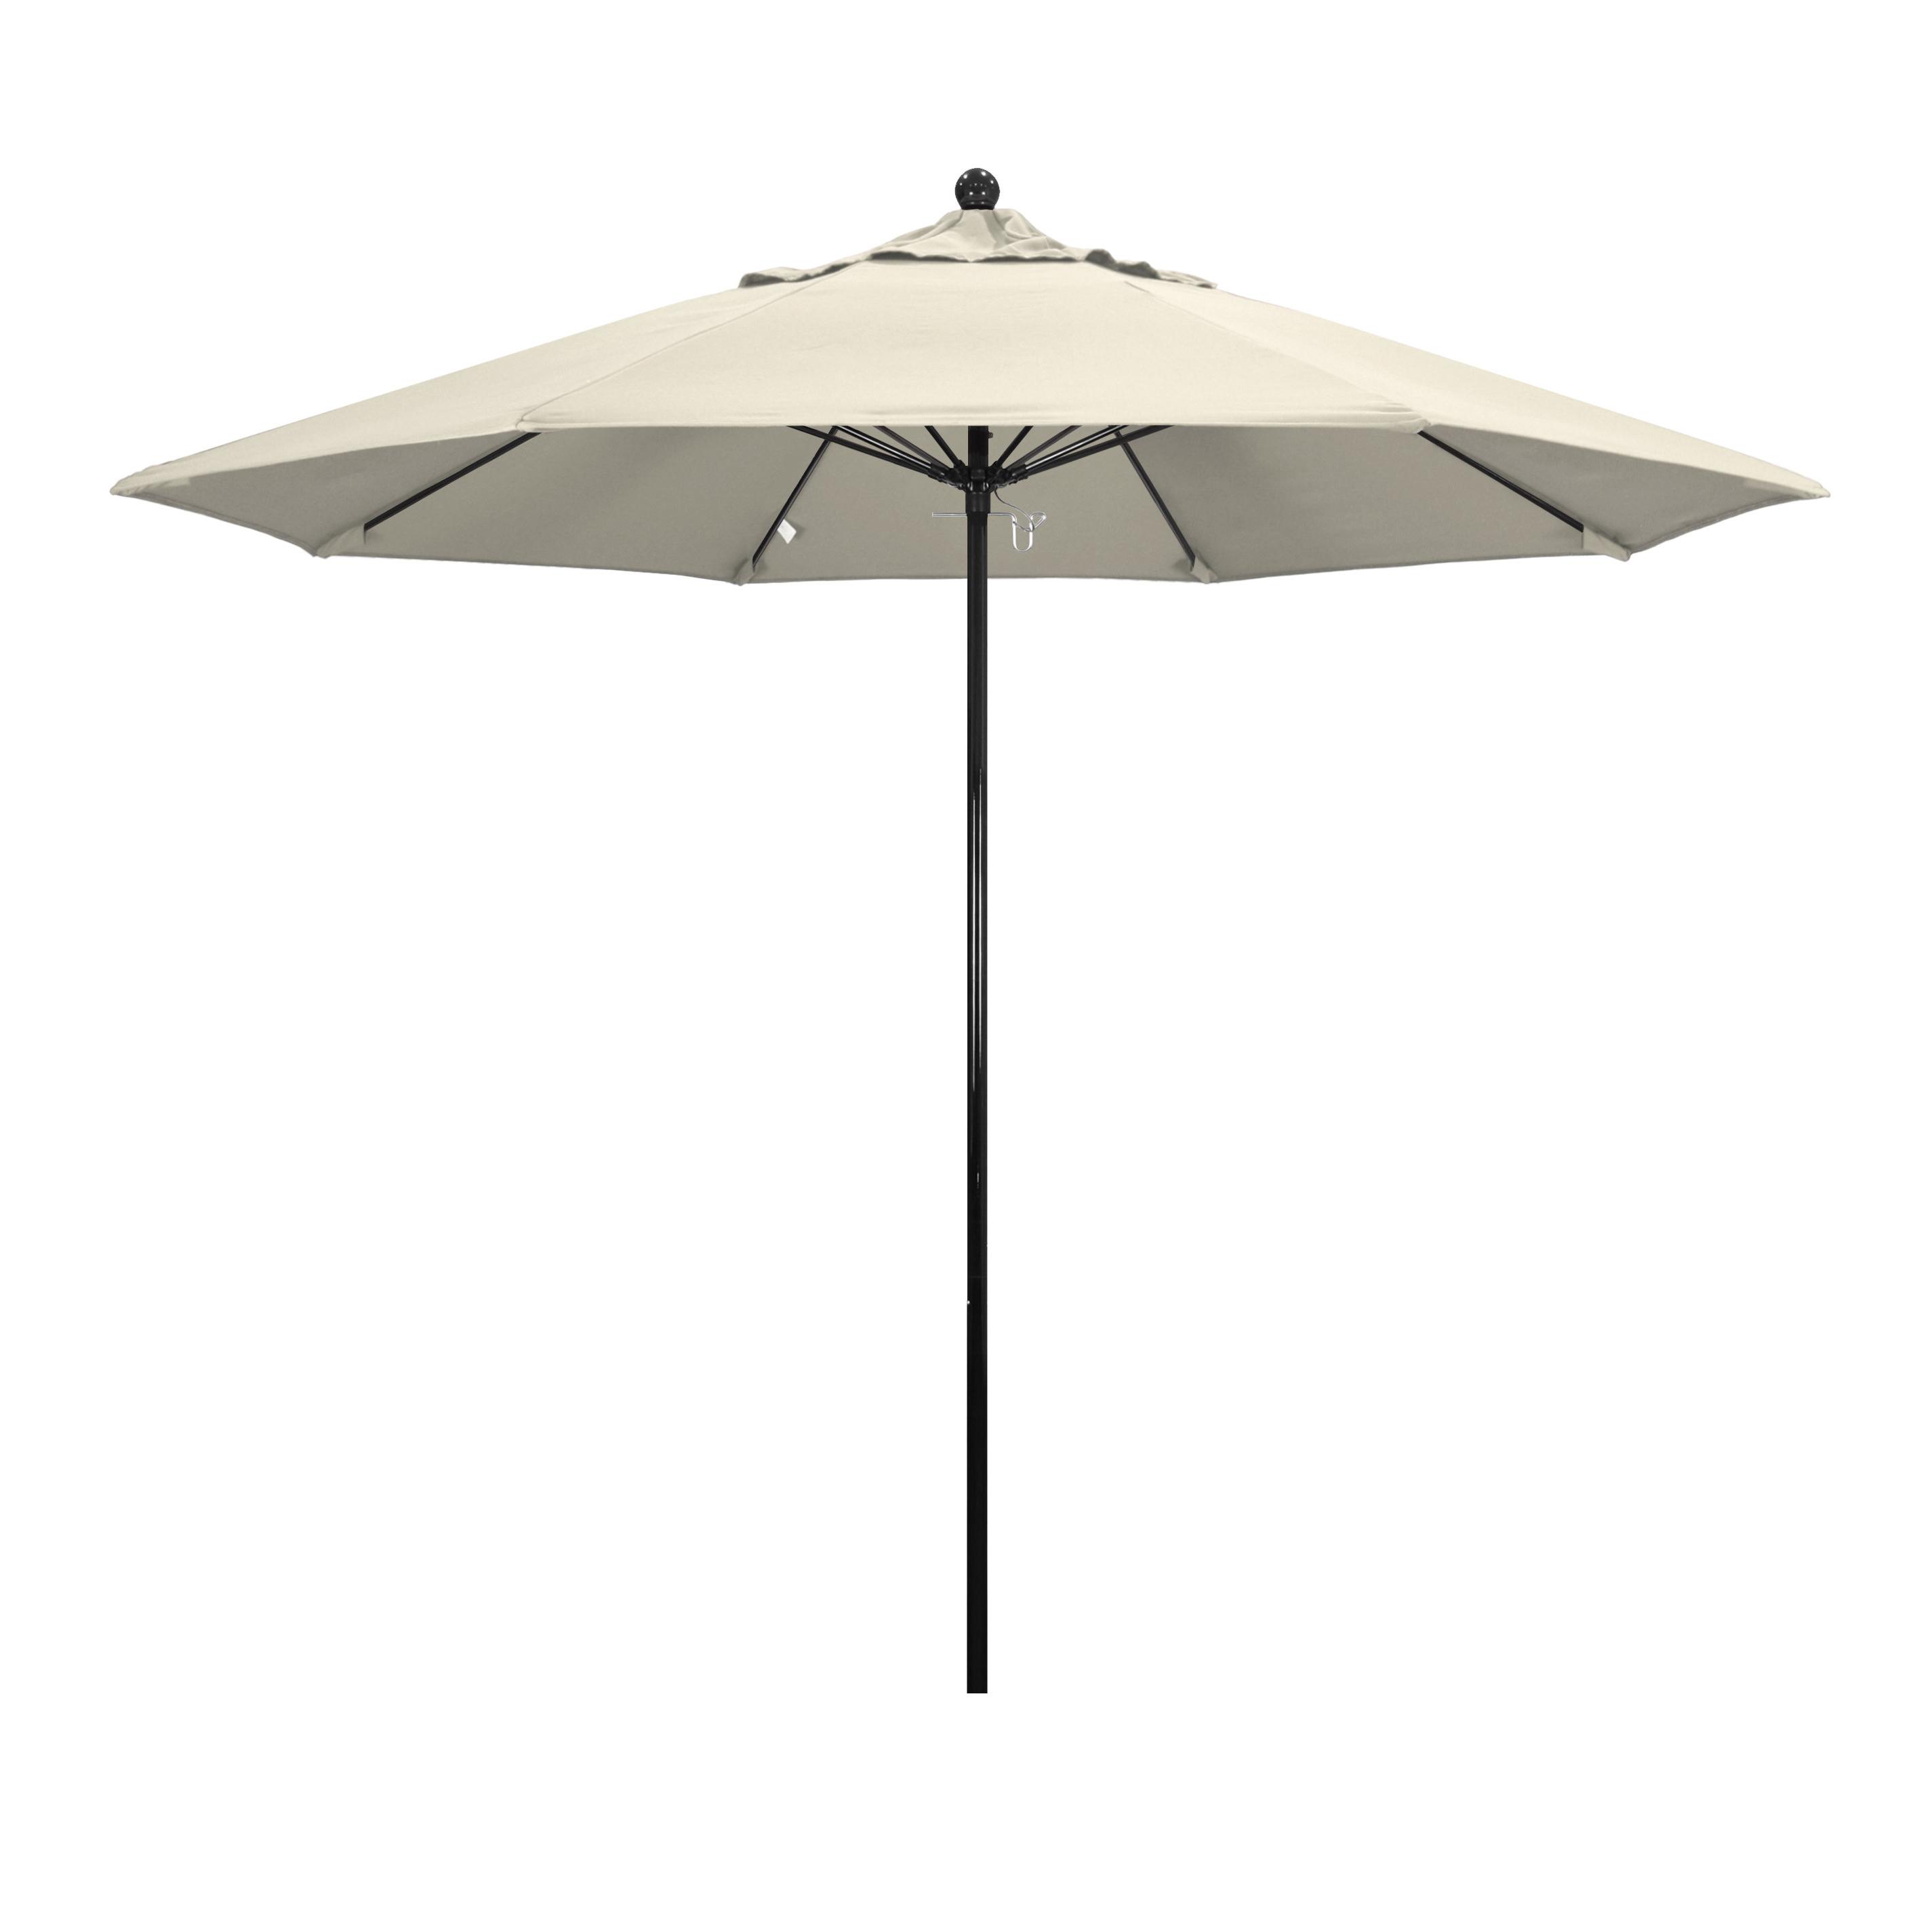 Most Popular 9' Market Umbrella Pertaining To Belles  Market Umbrellas (Gallery 8 of 20)